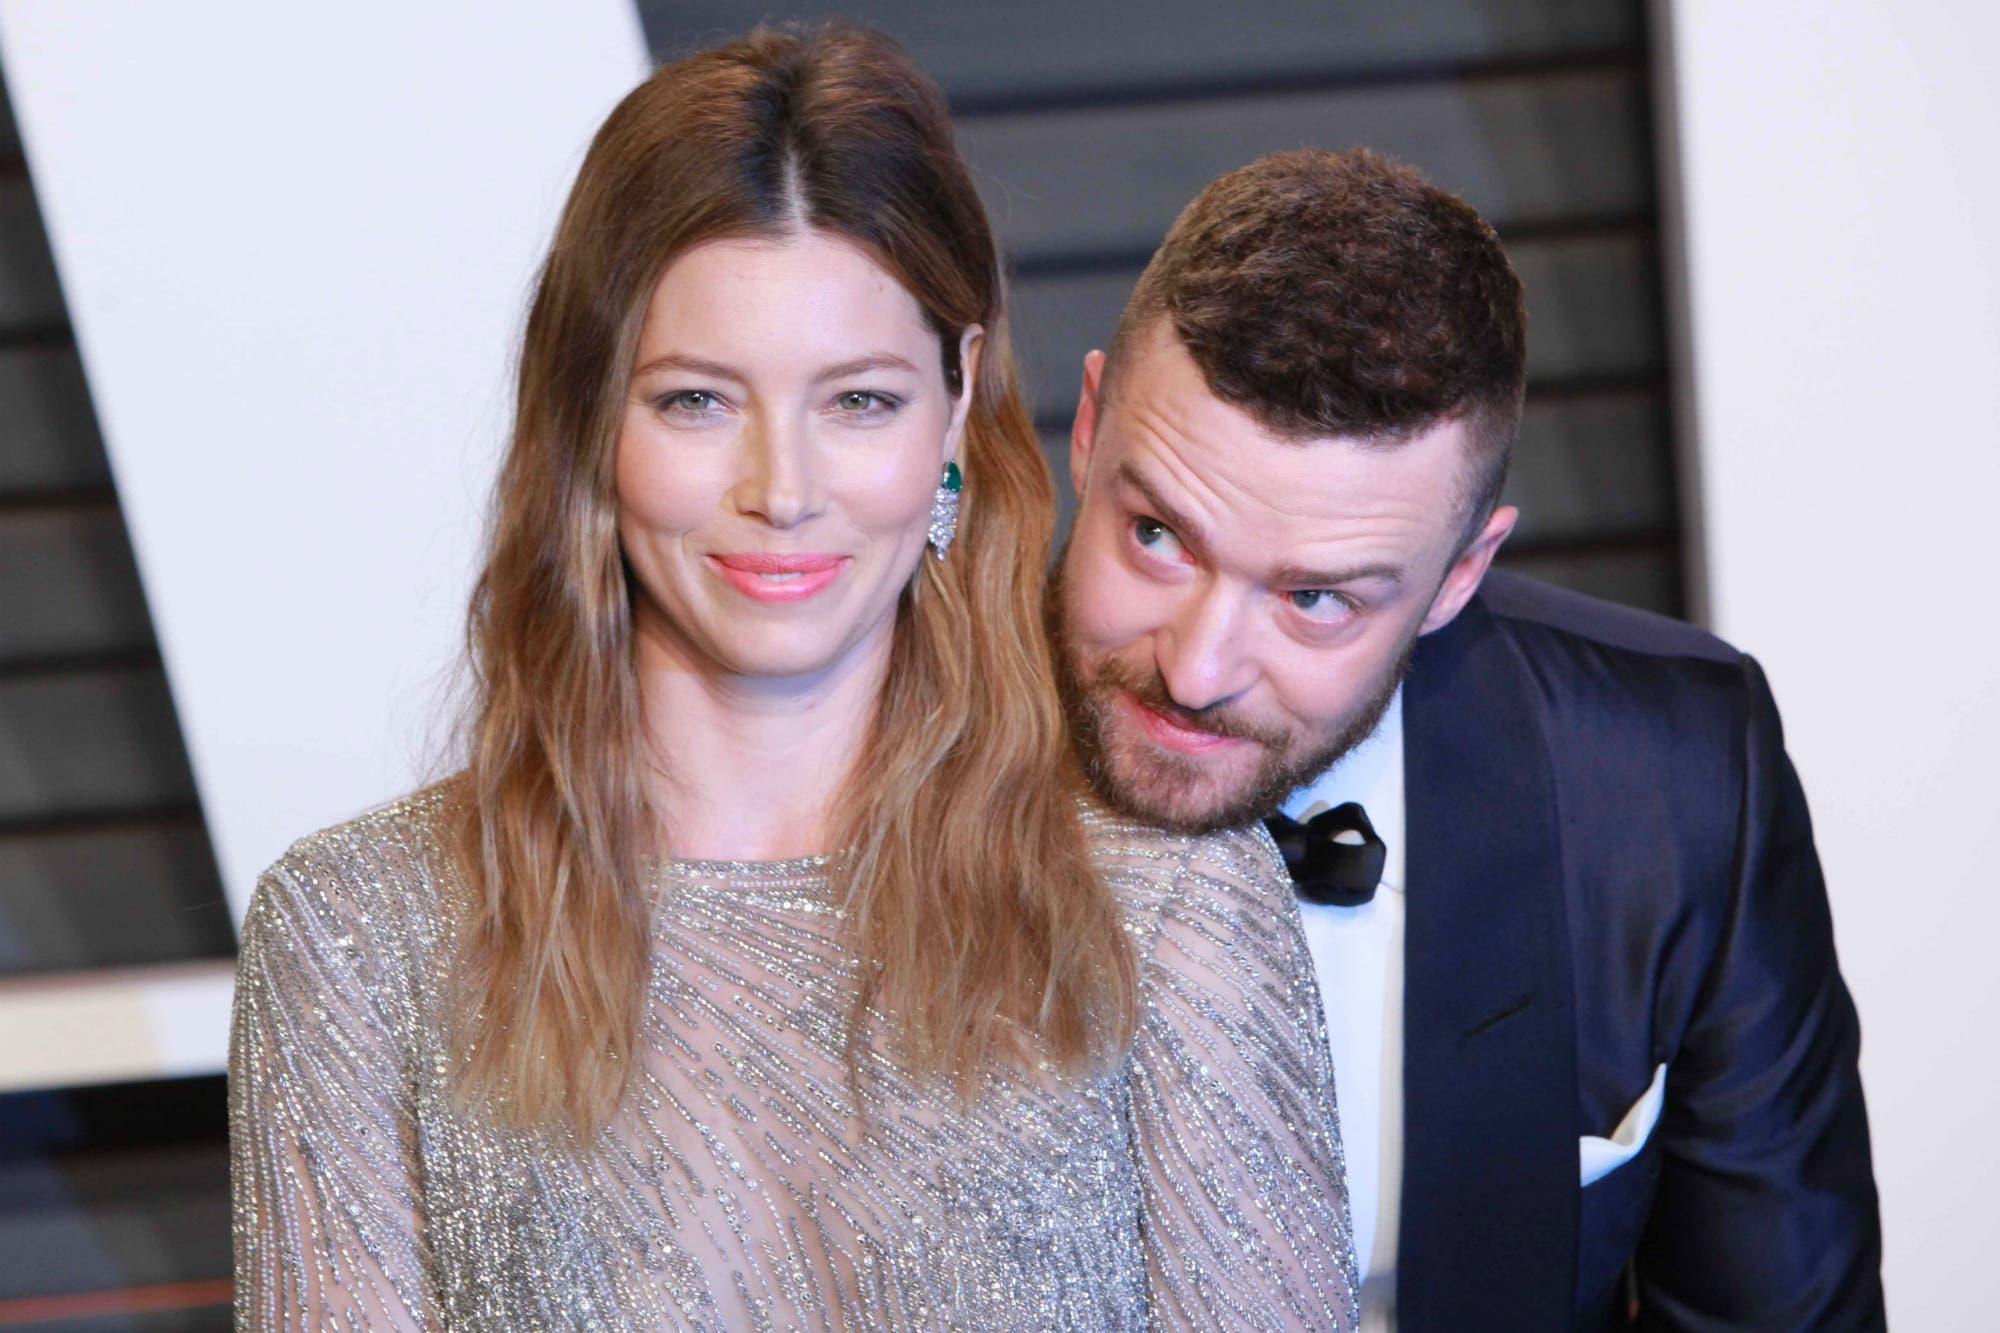 Justin Timberlake pidió disculpas públicas por sus fotos con Alisha Wainwright